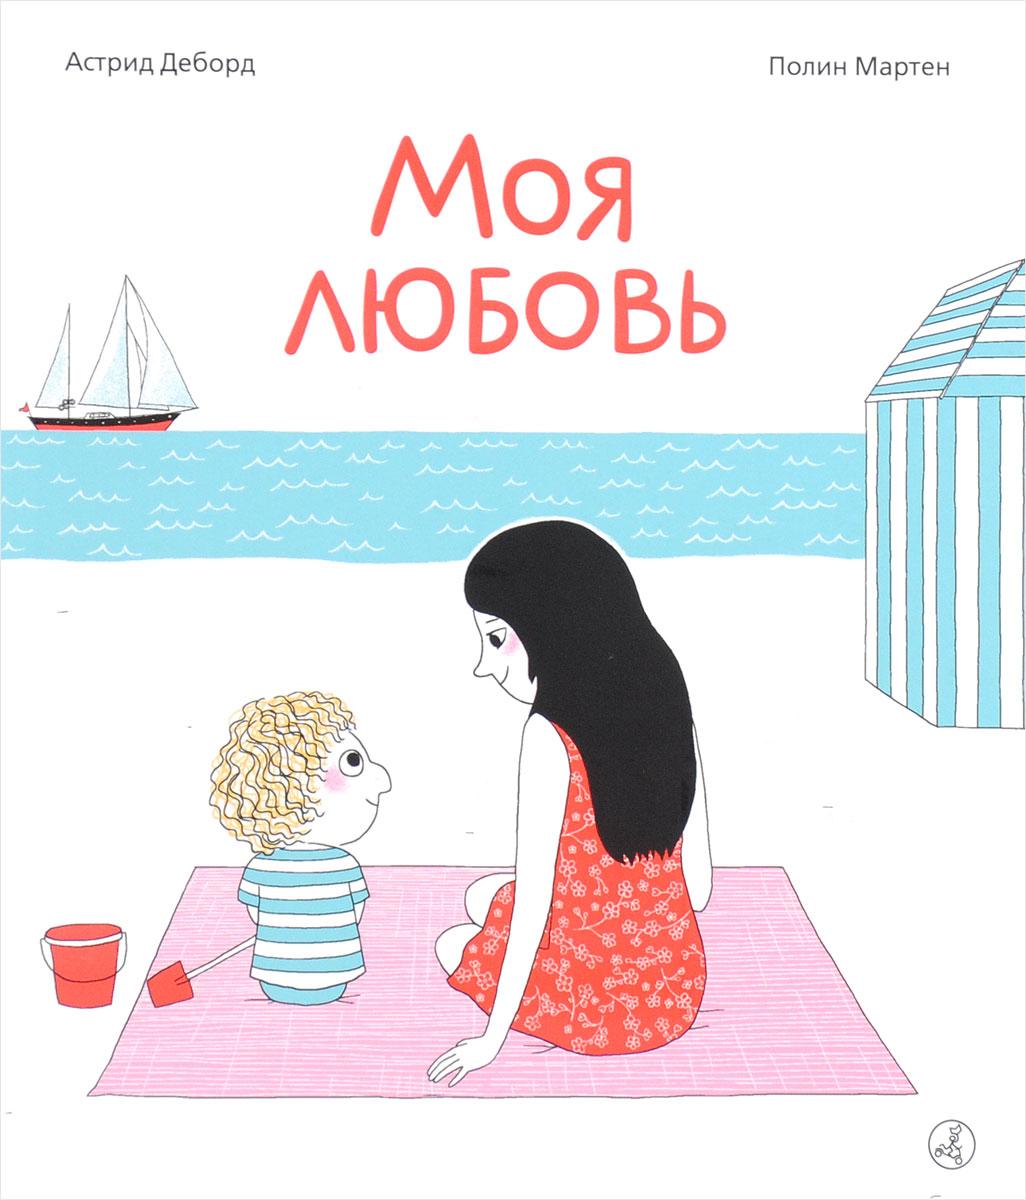 Астрид Деборд, Полин Мартен Моя любовь мартен люган